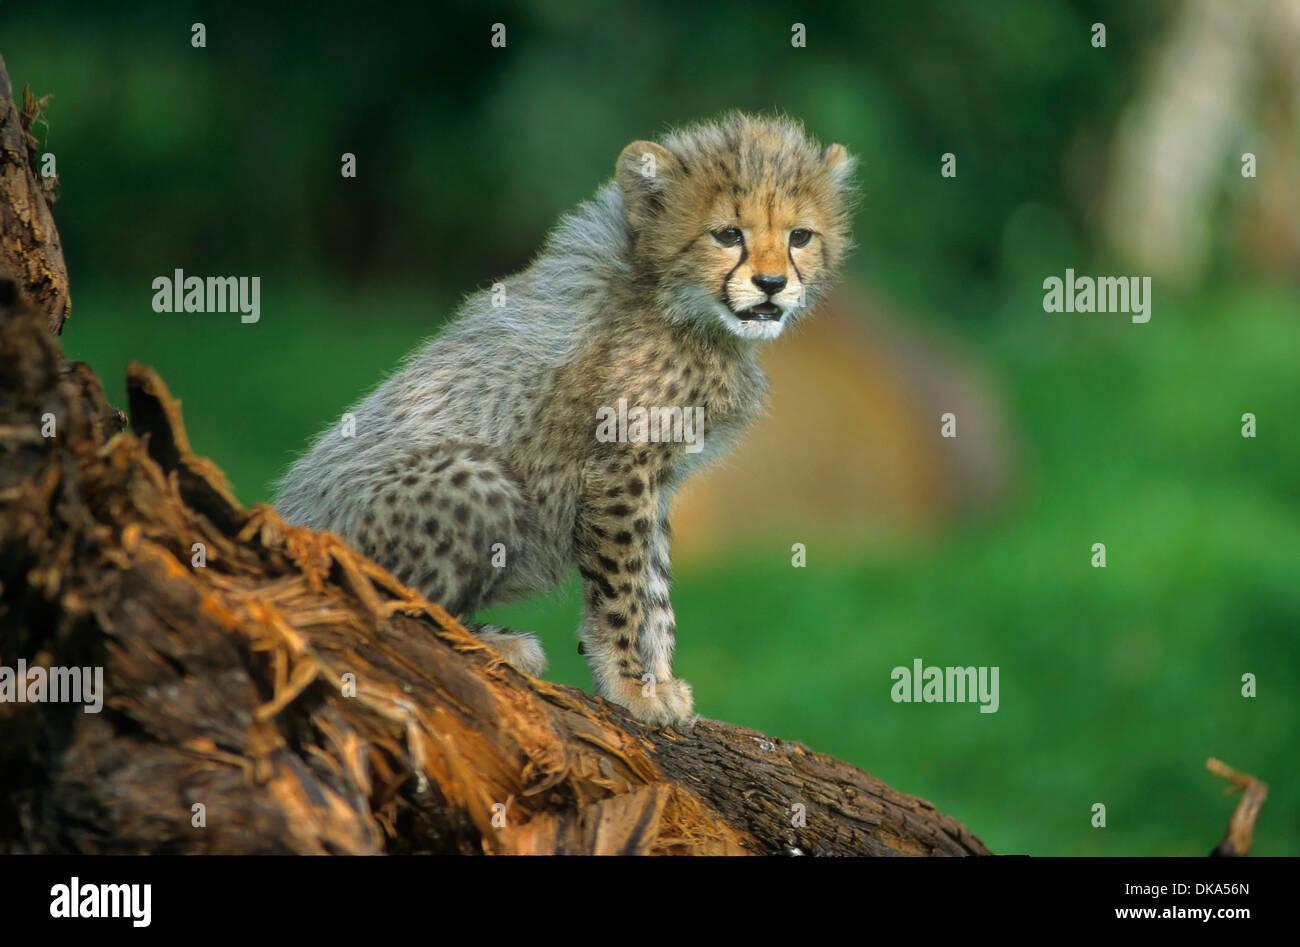 Ghepardo (Acinonyx jubatus), il gepard - Baby zwei Monate alt, Gepard (Acinonyx jubatus) Immagini Stock